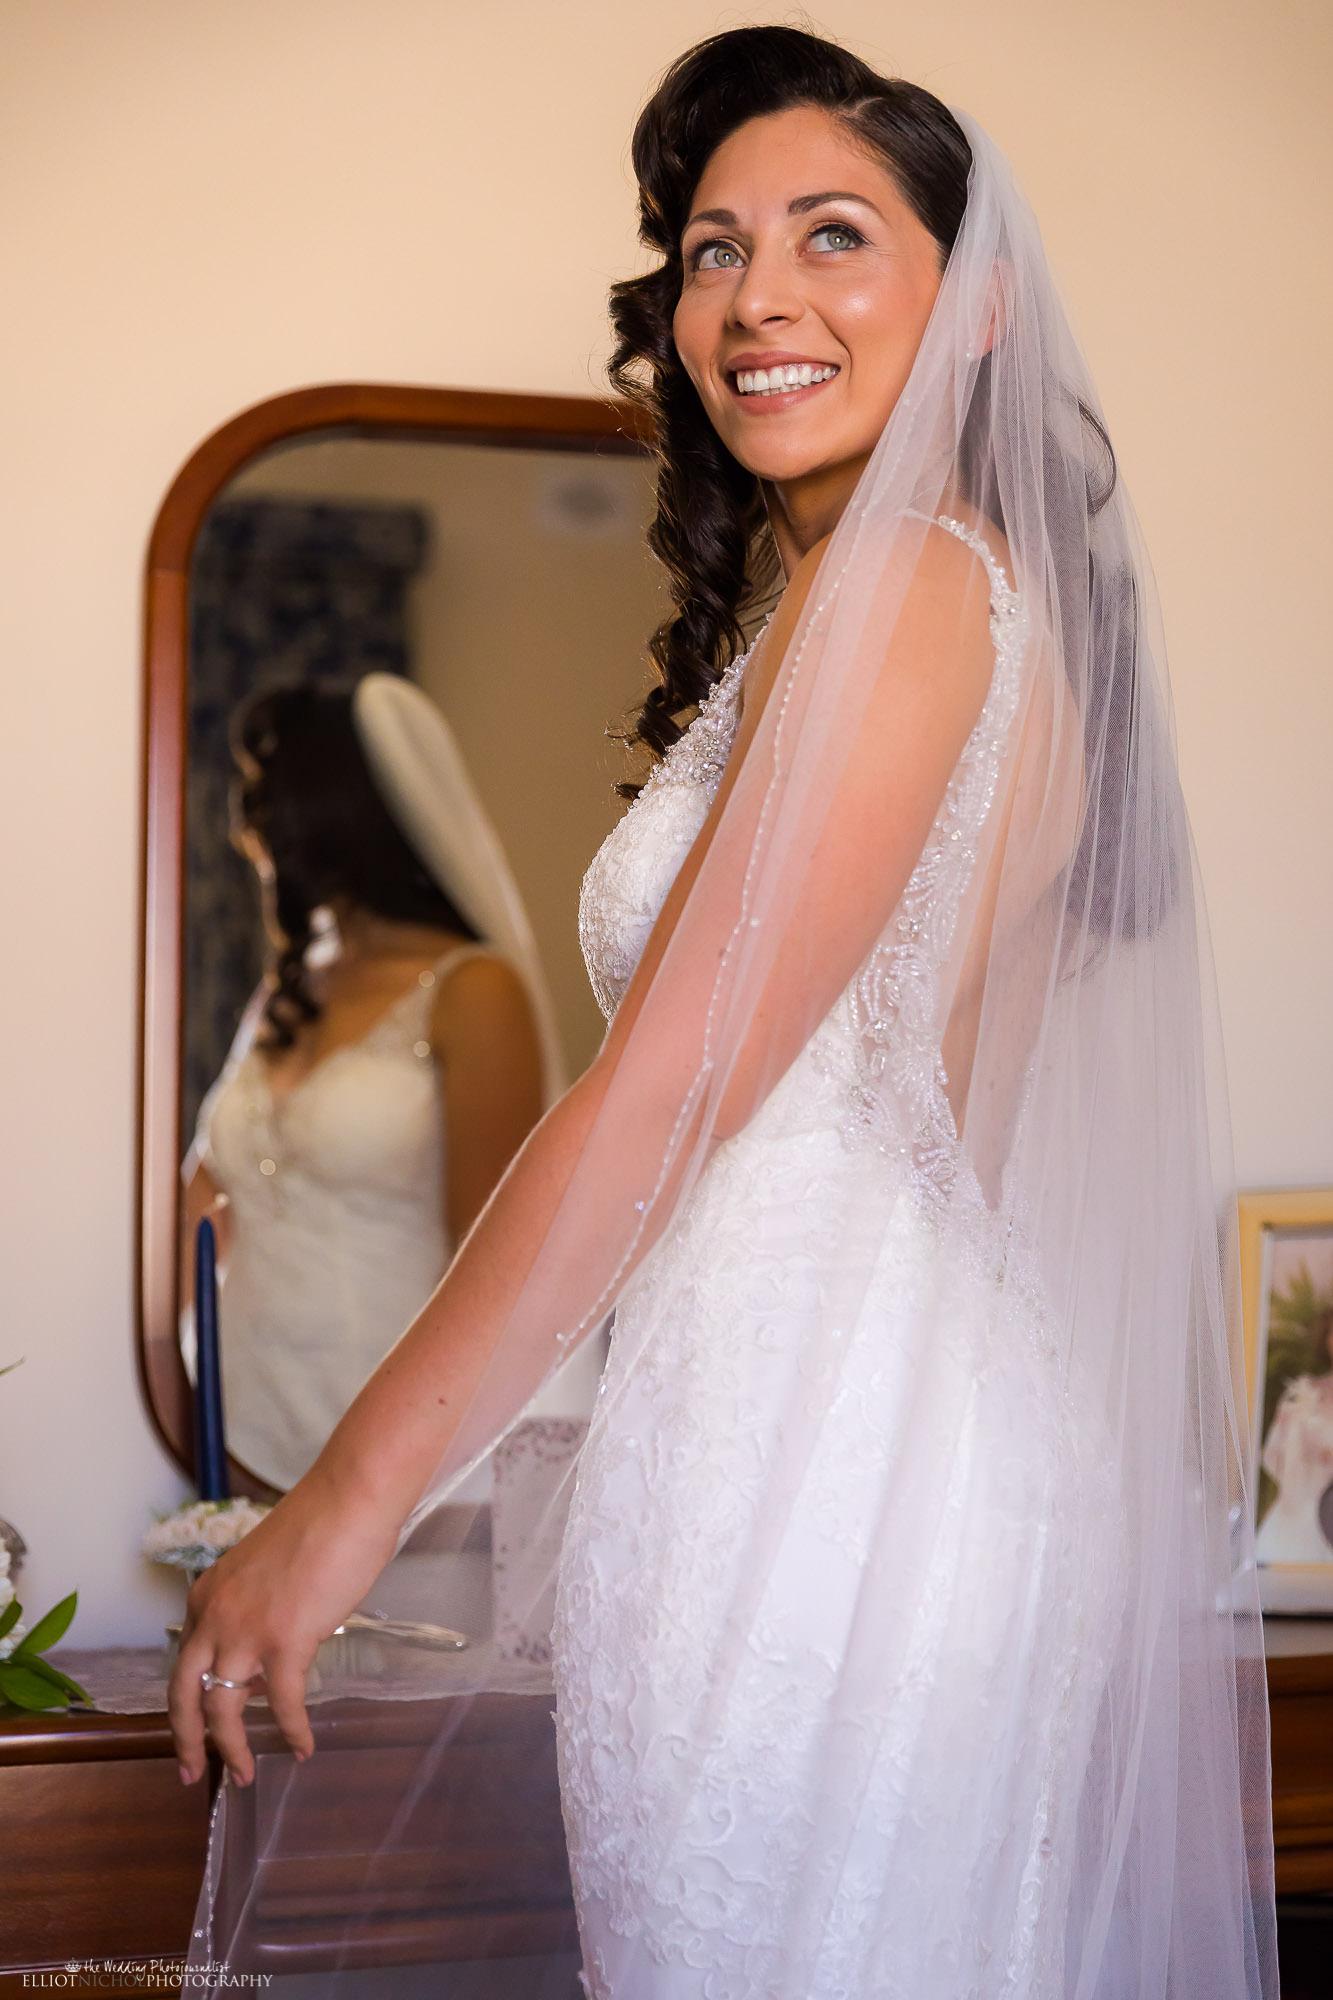 happy-bride-wedding-dress-veil-photography-Newcastle-Upon-Tyne